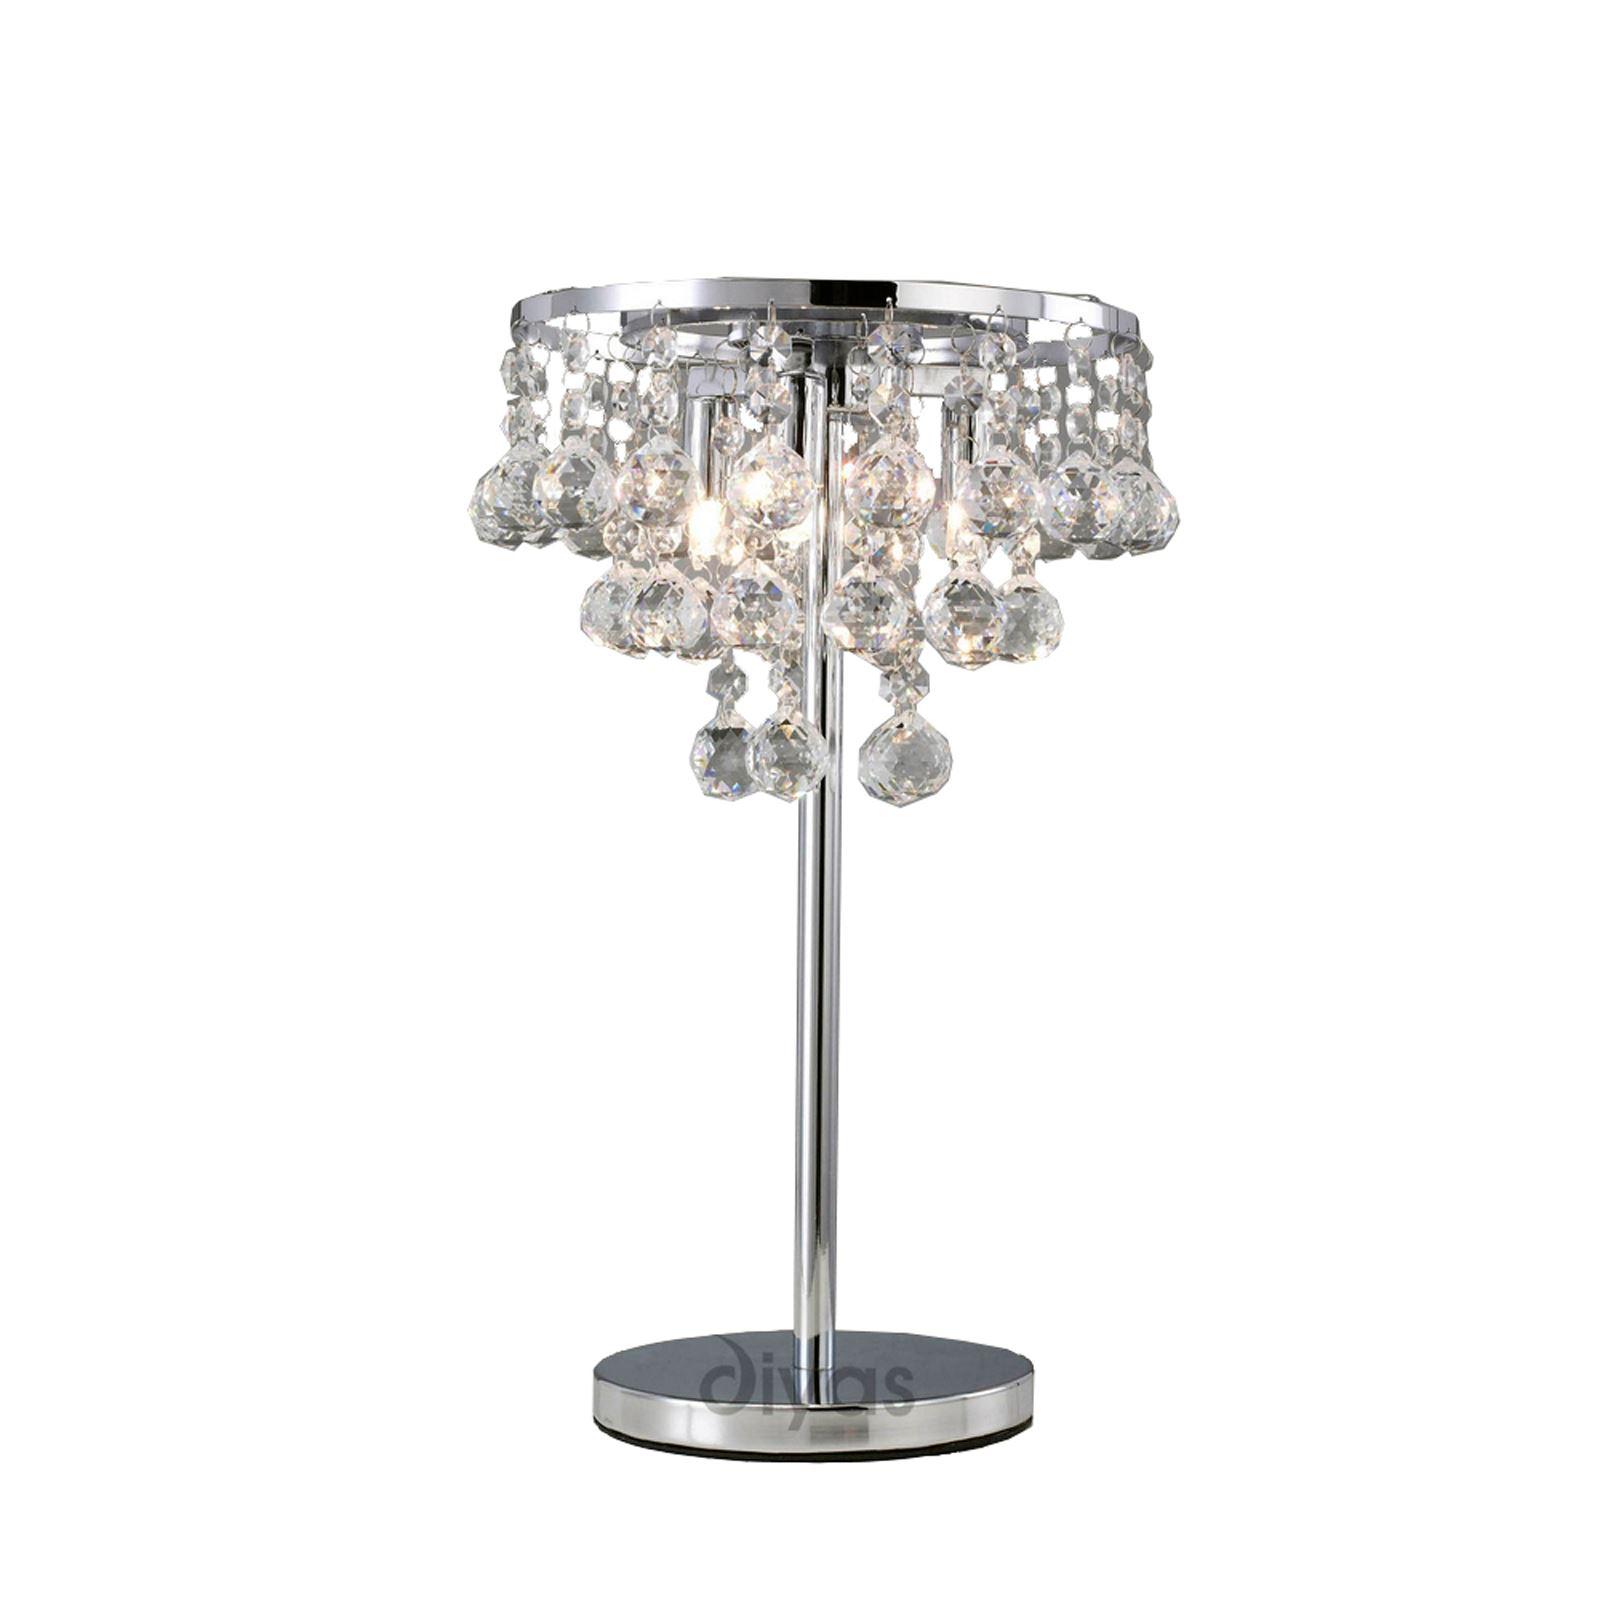 Decorative Table Lamp 3 Light Polished Chrome/Crystal Modern Design